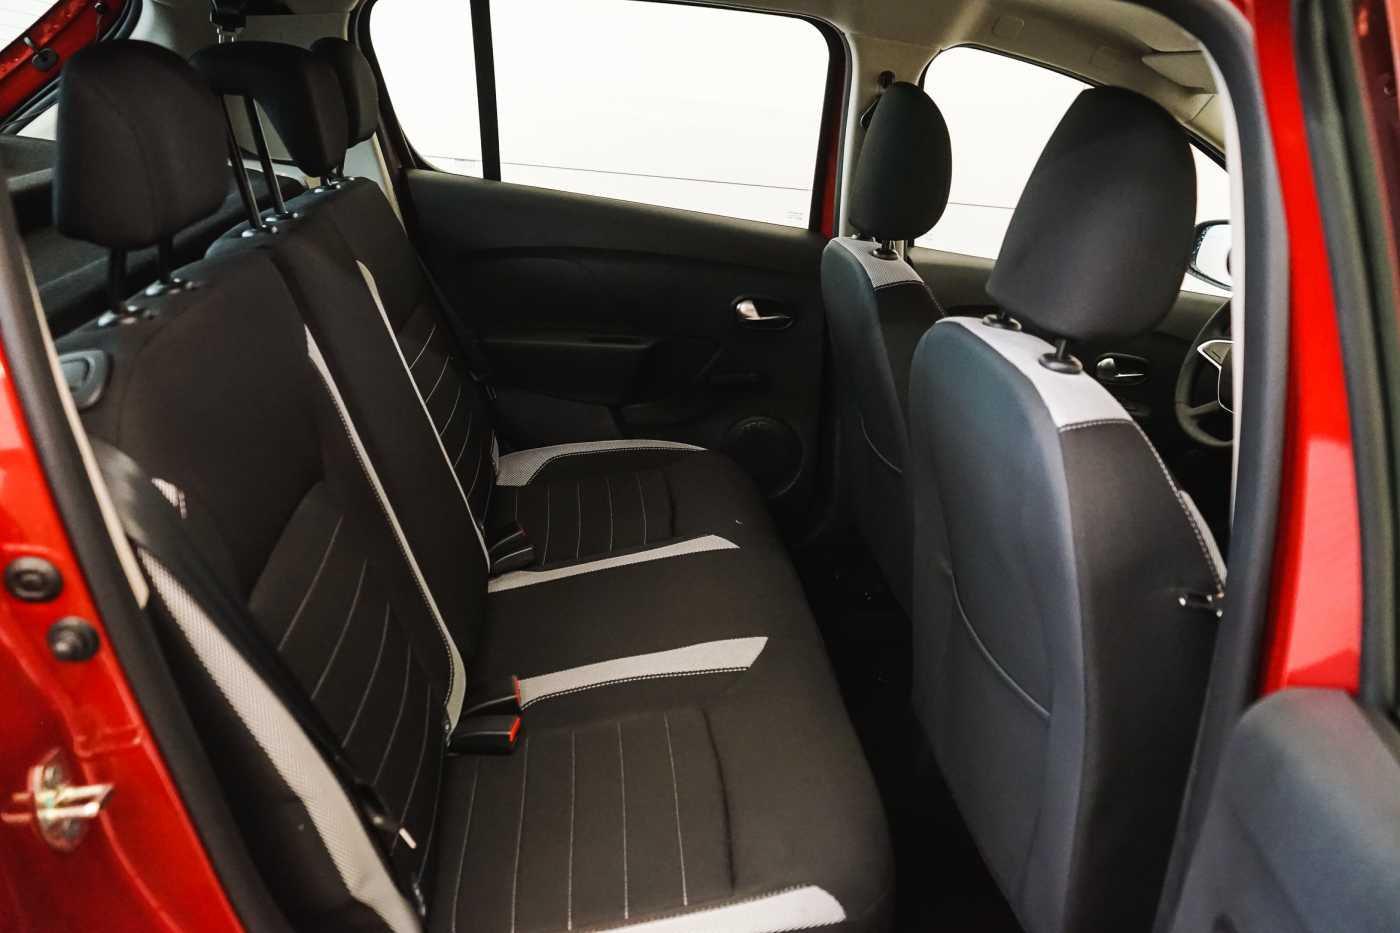 Dacia Sandero 1.0i SCe Stepway // Navi, Bluetooth, Airco, USB 10/27